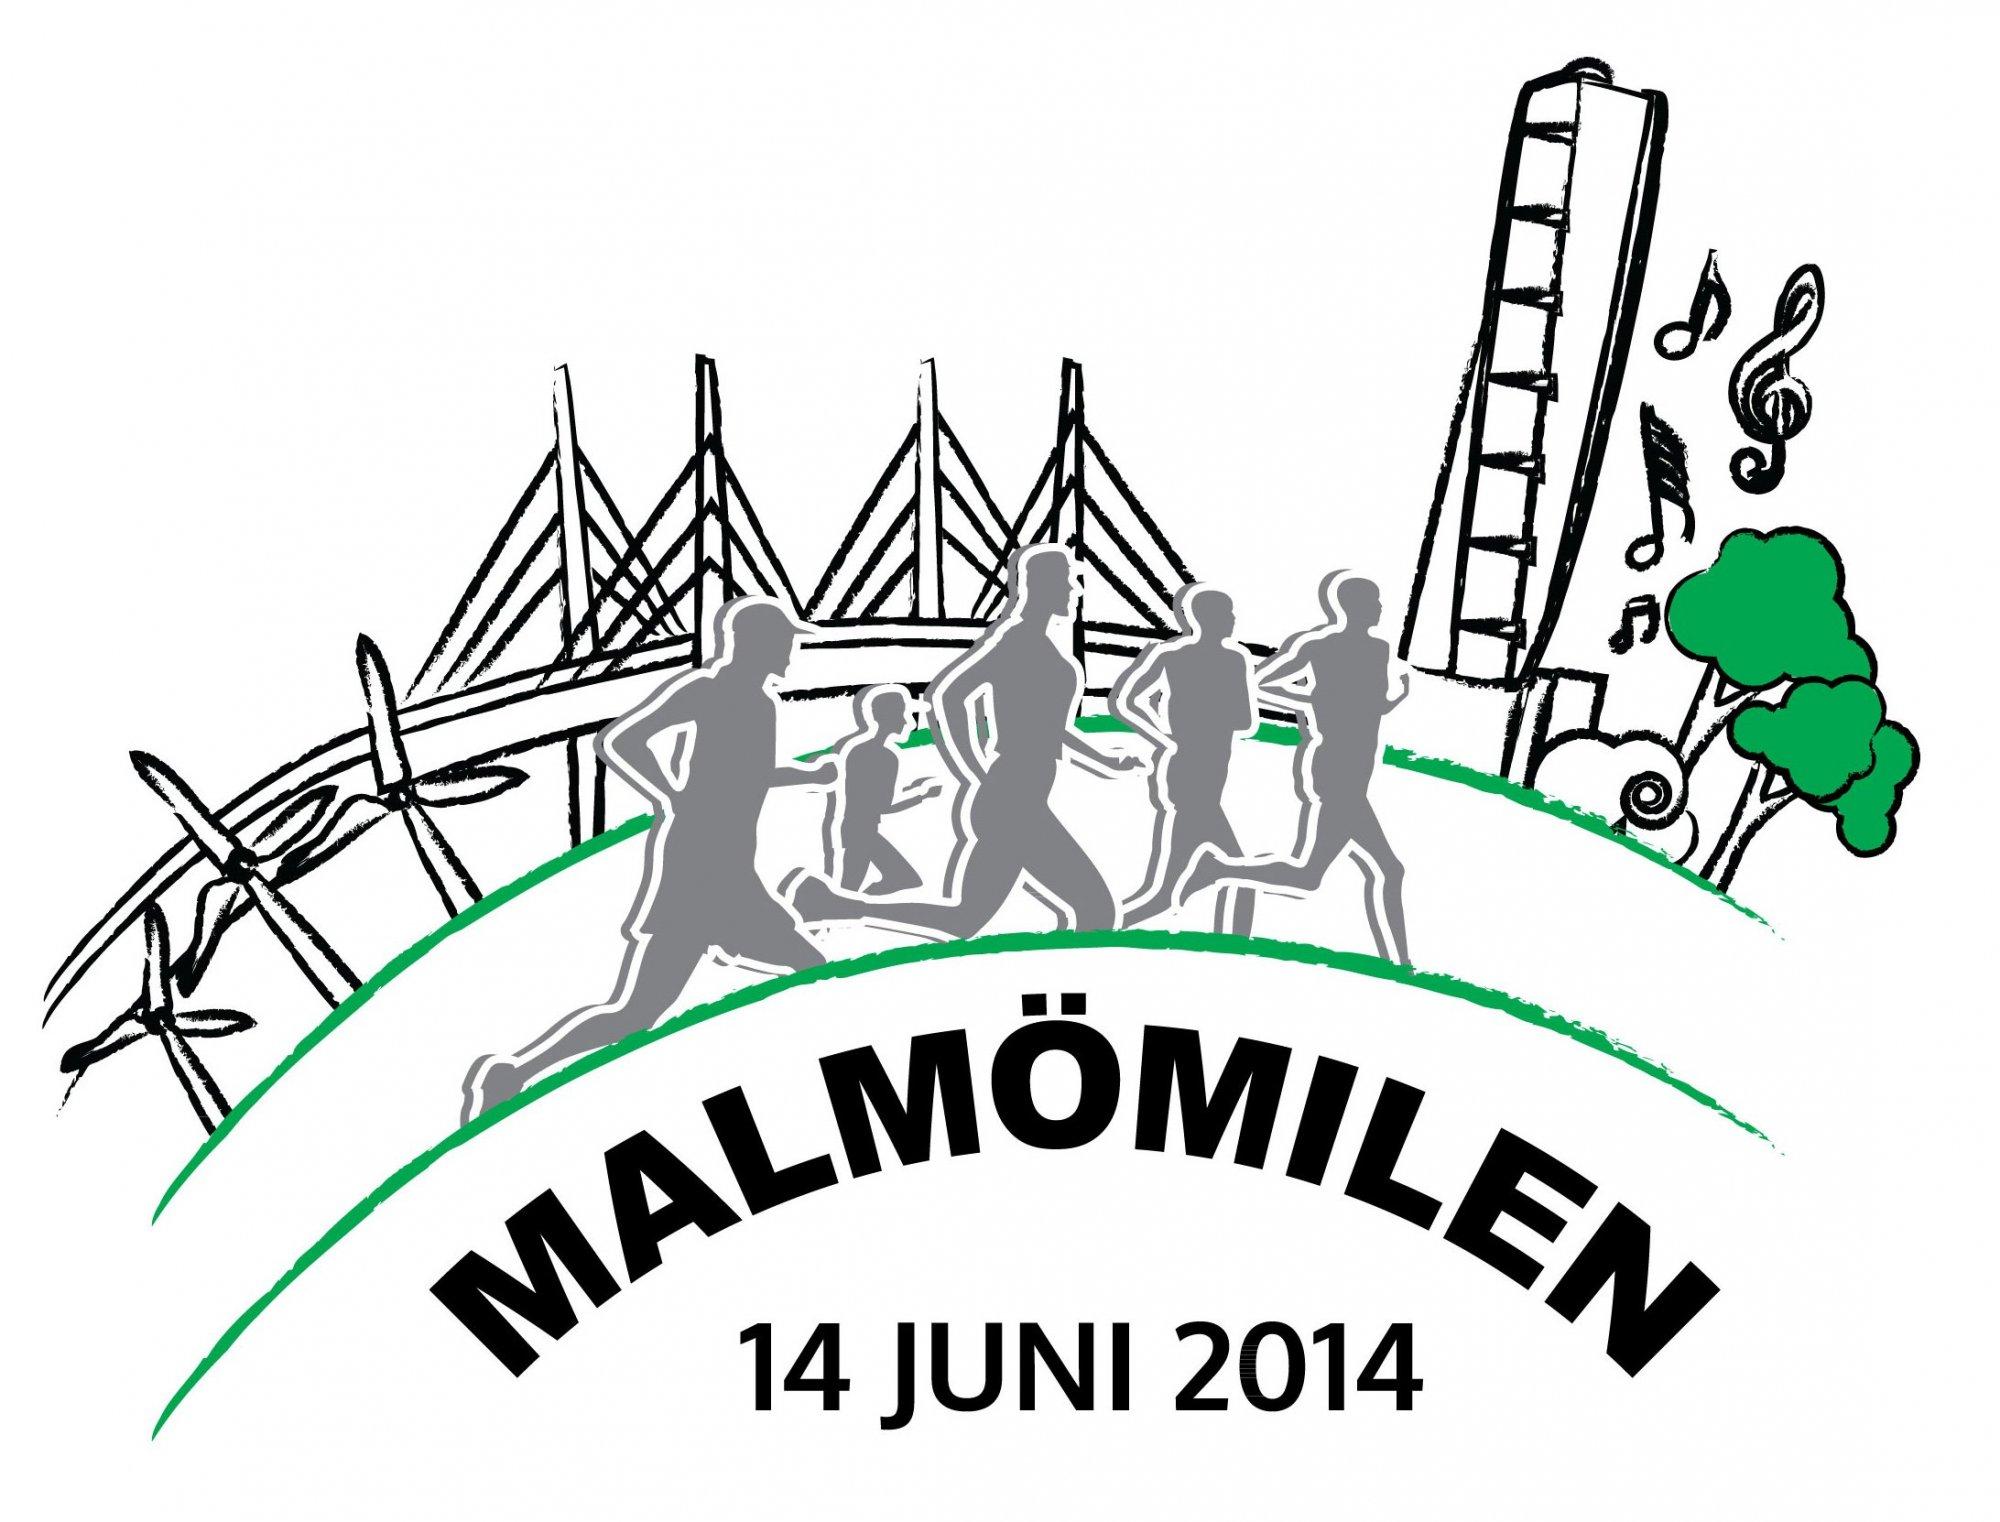 MalmöMilen 2014